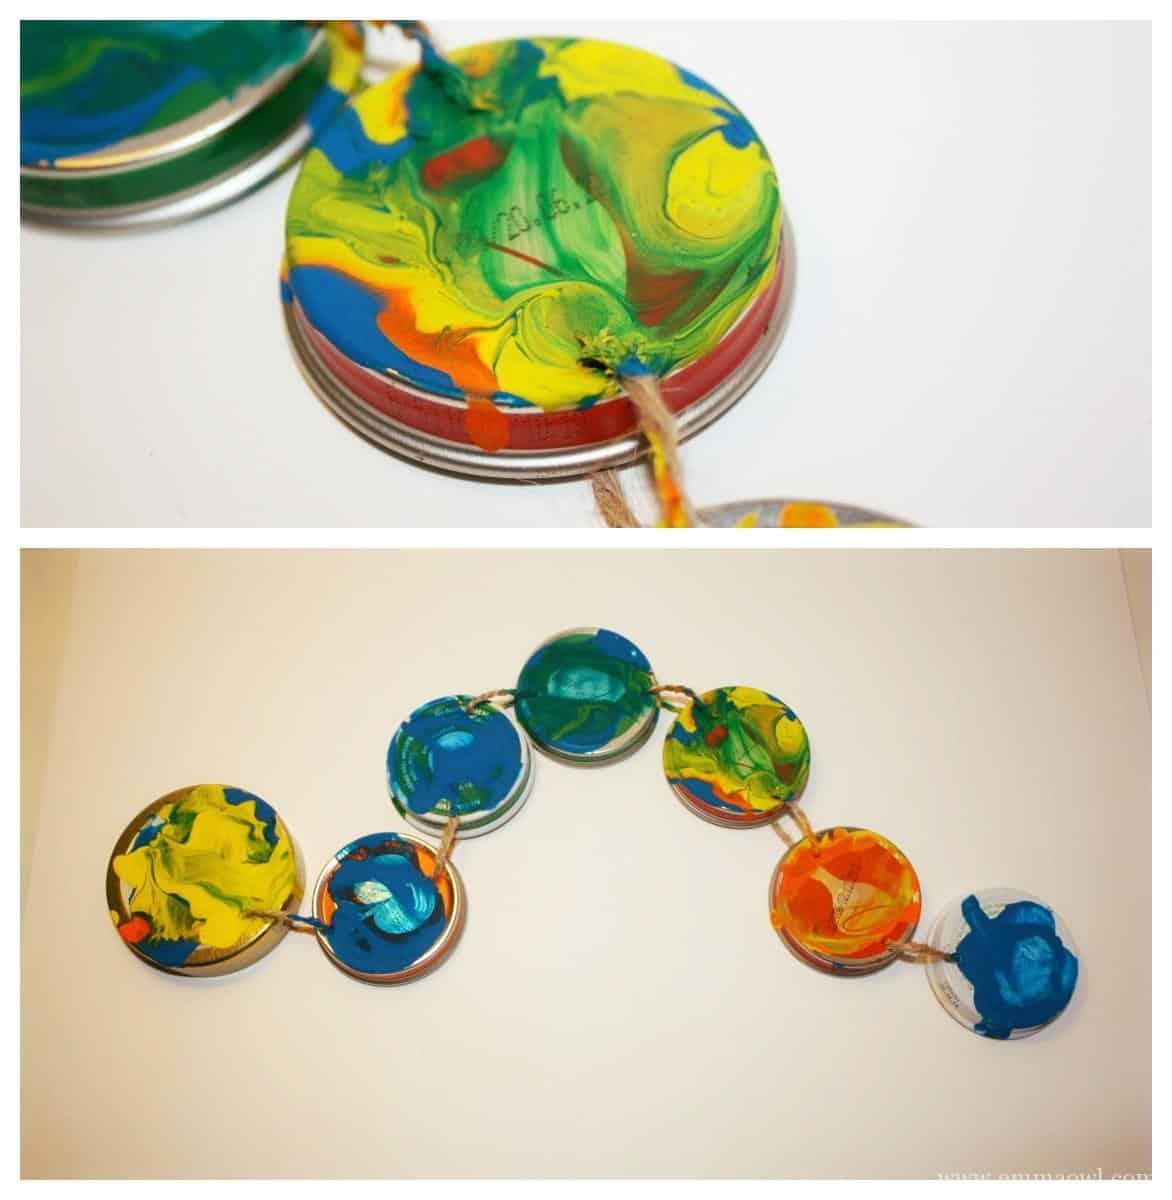 Make your own caterpillar using jar lids emma owl for Caterpillar crafts for preschoolers